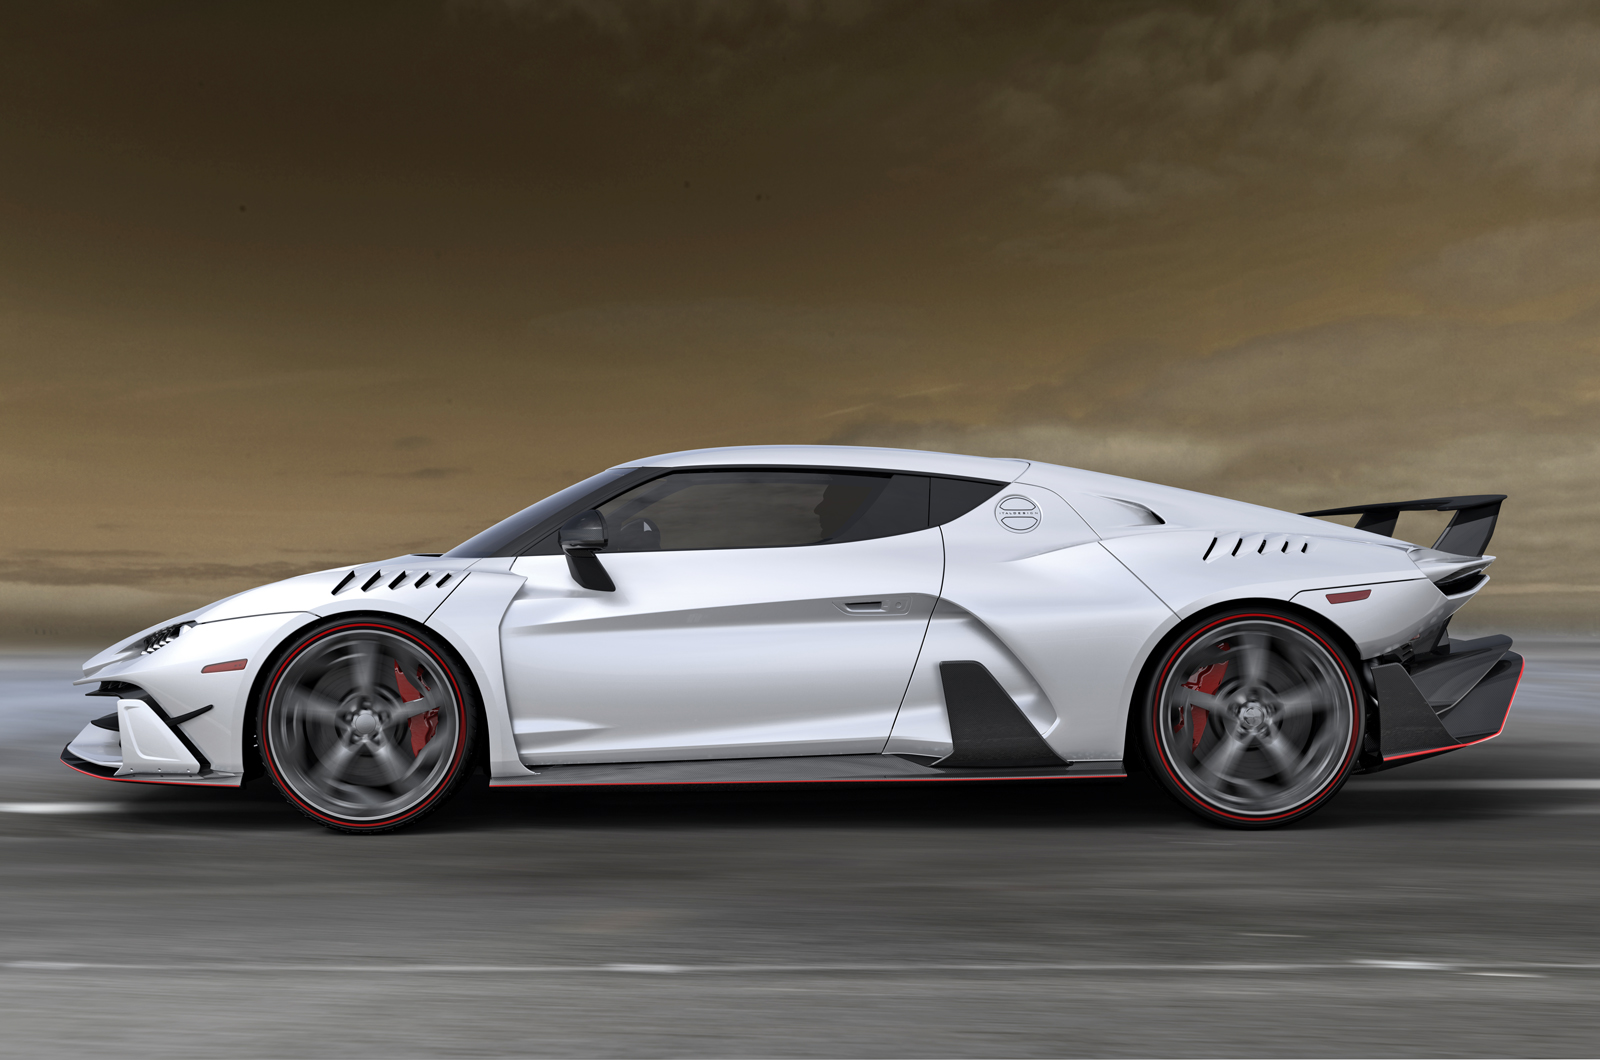 Italdesign Zerouno V10 Supercar Gets Geneva Debut Autocar